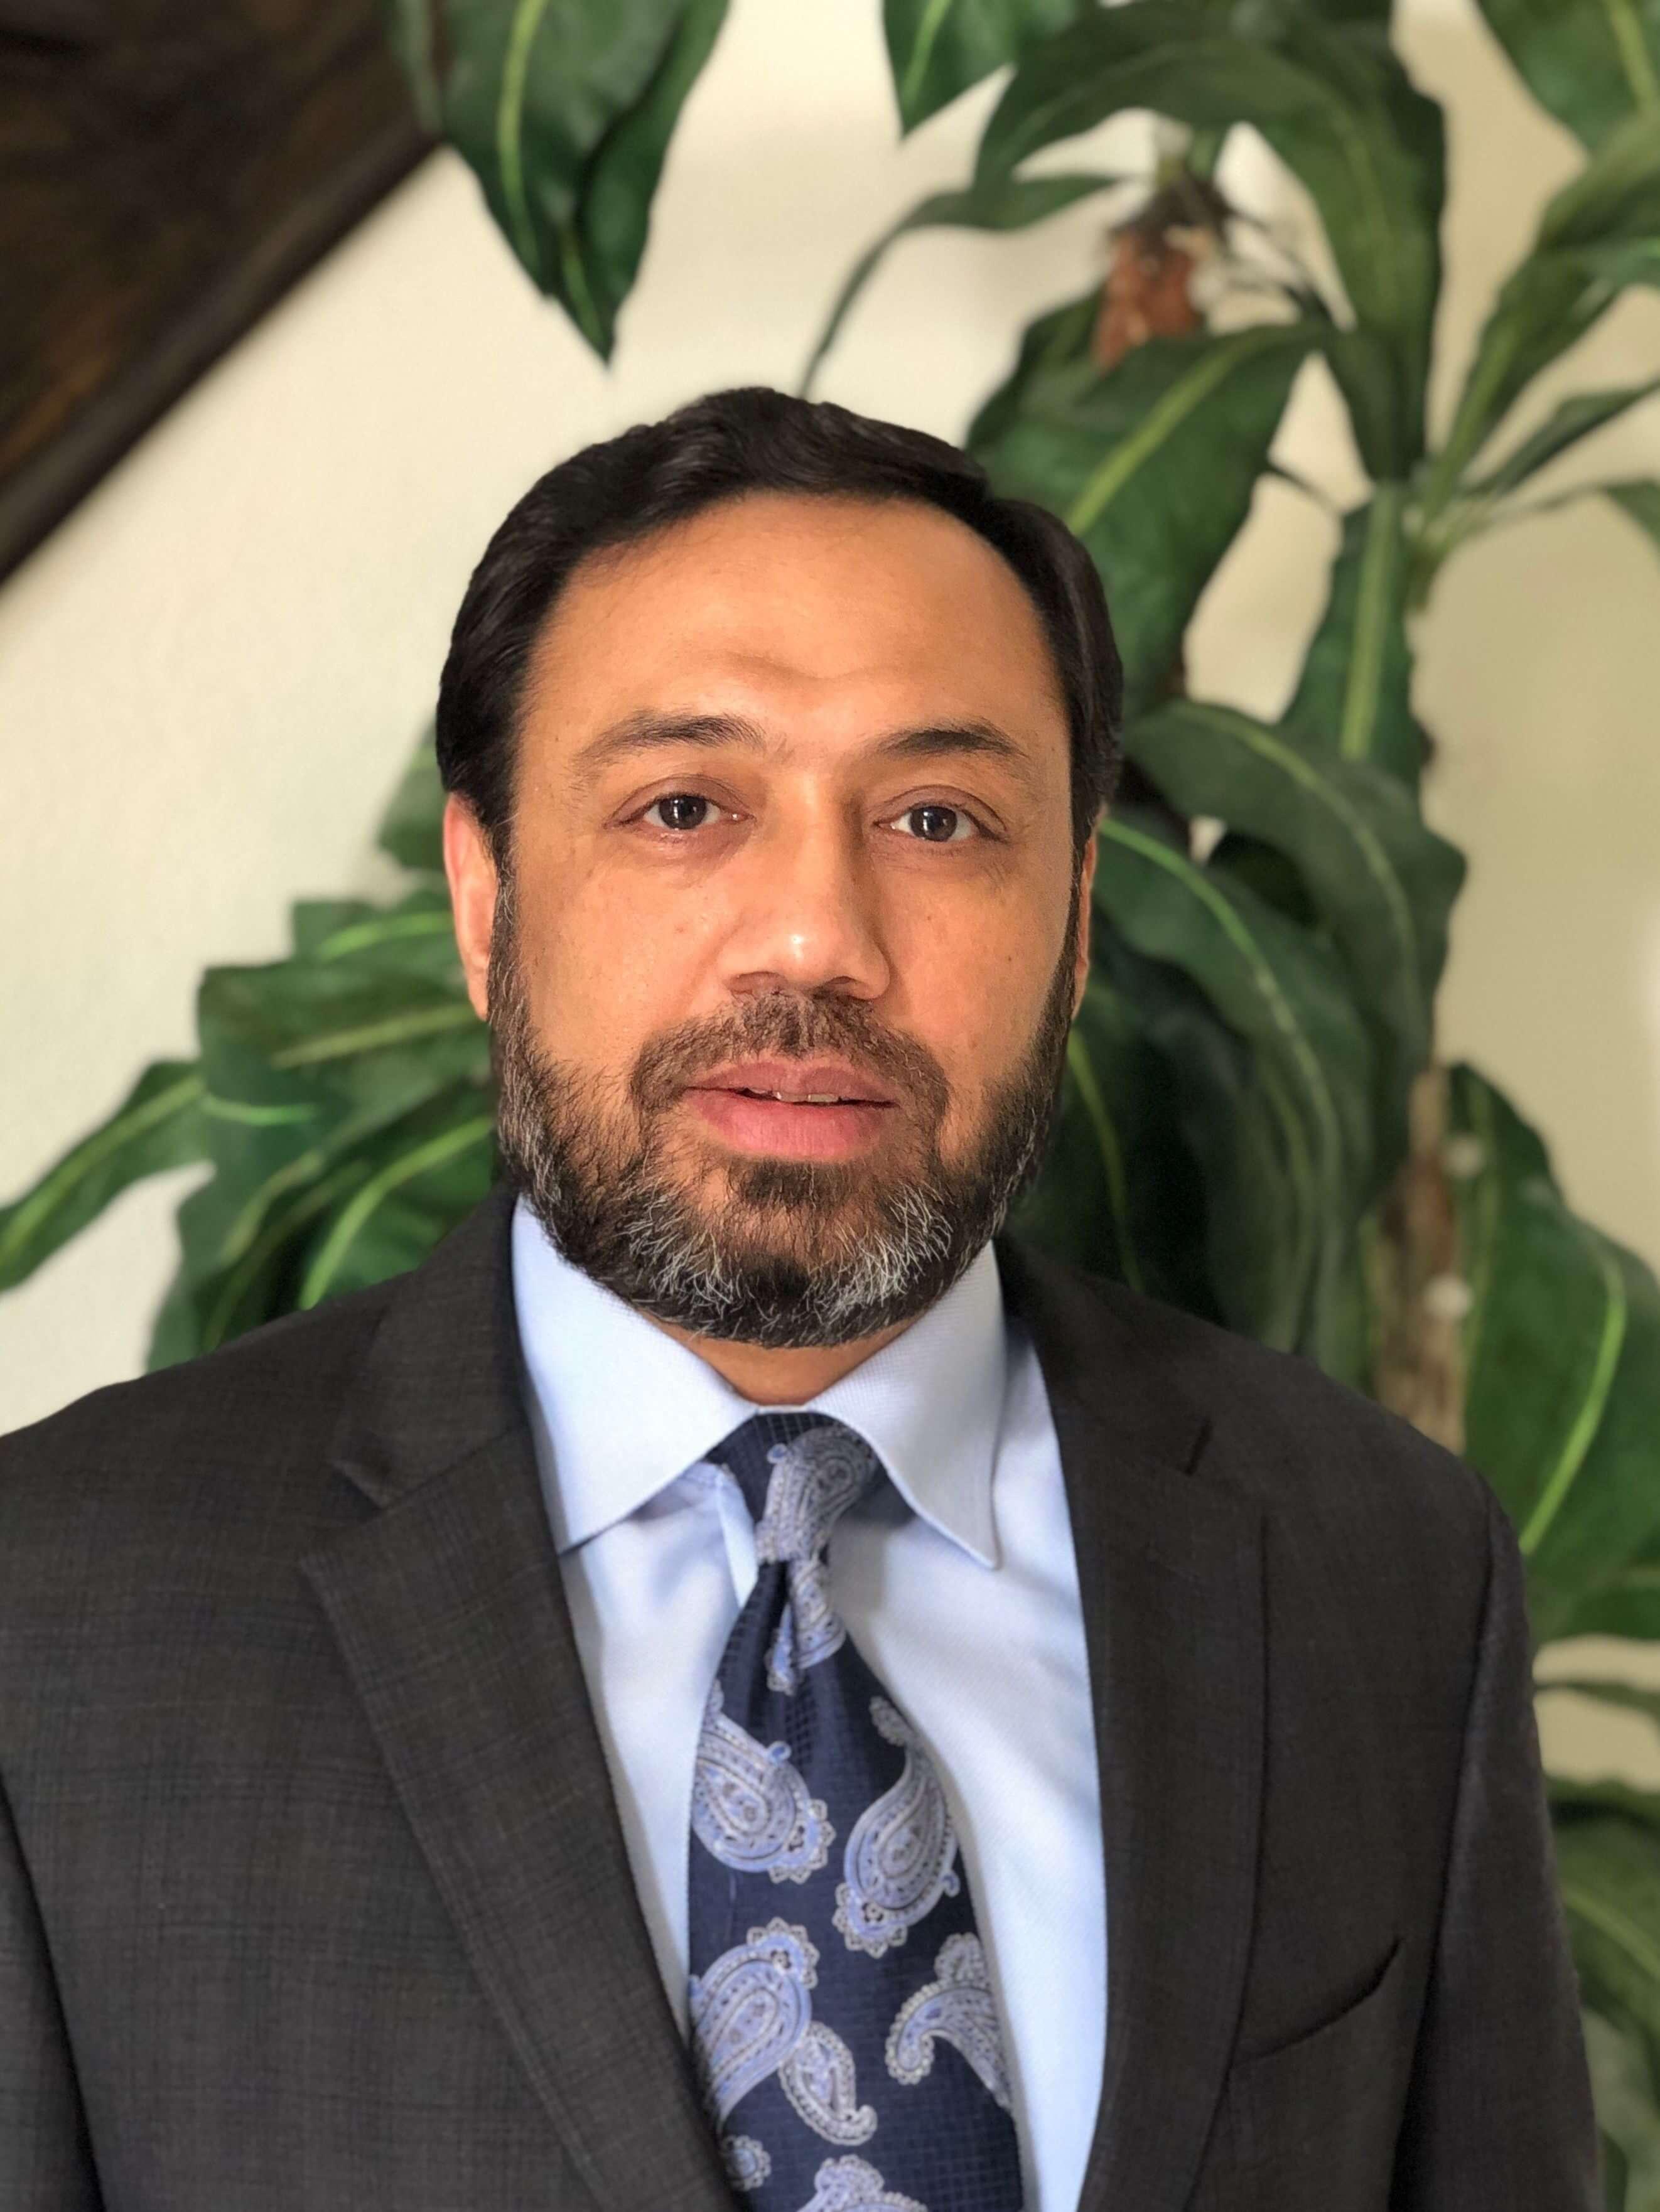 Dr. Shahzad Allawala